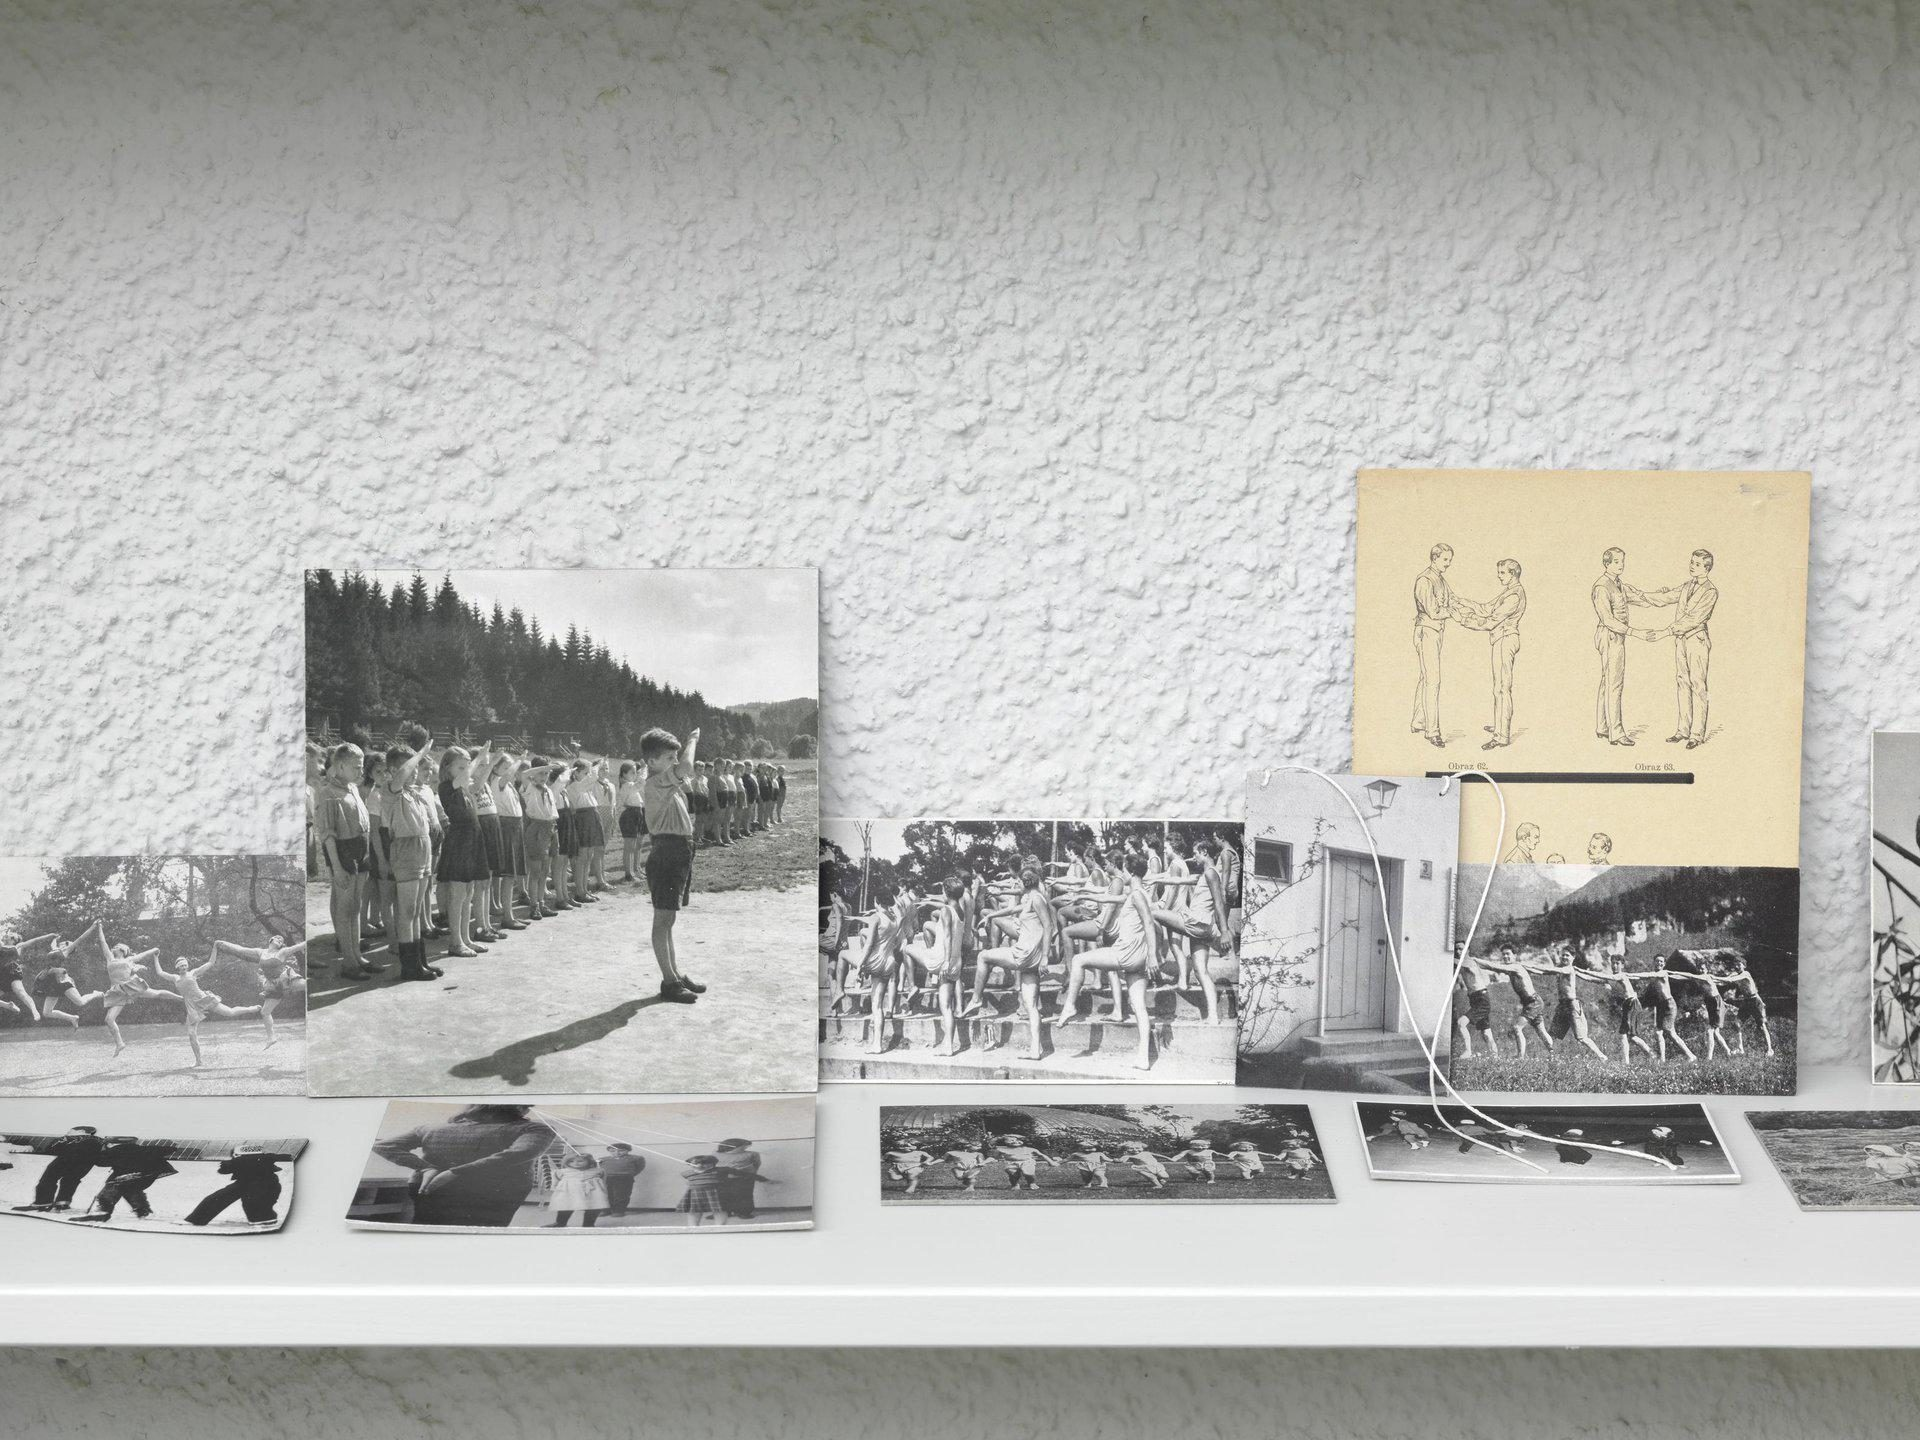 Eva Kot'átková, Psychological Theatre, Collection of Oskar, A Boy, Who Talks through Images, 2014, Detail